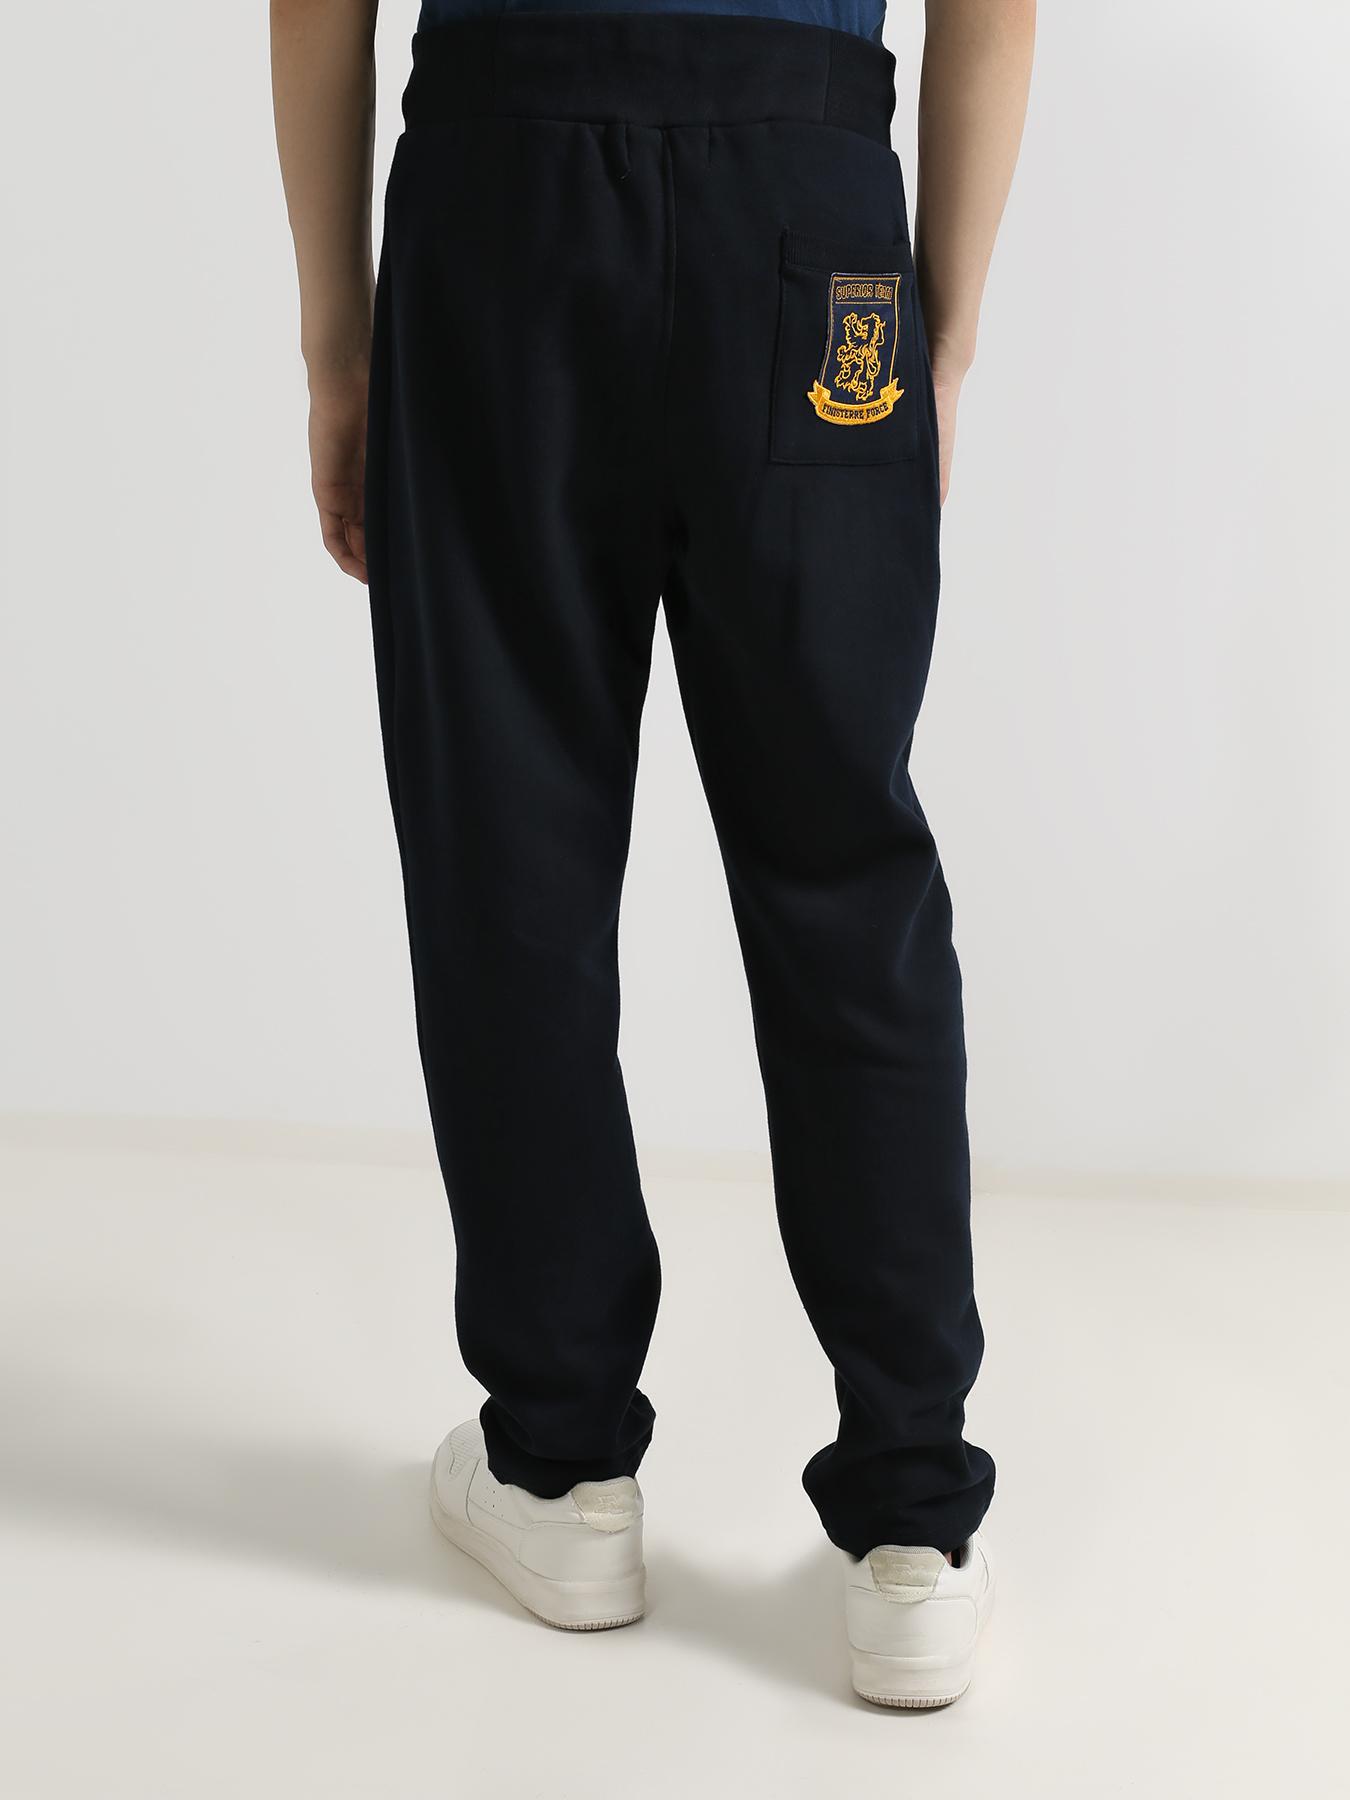 Finisterre Force Спортивные брюки 345078-030 Фото 2